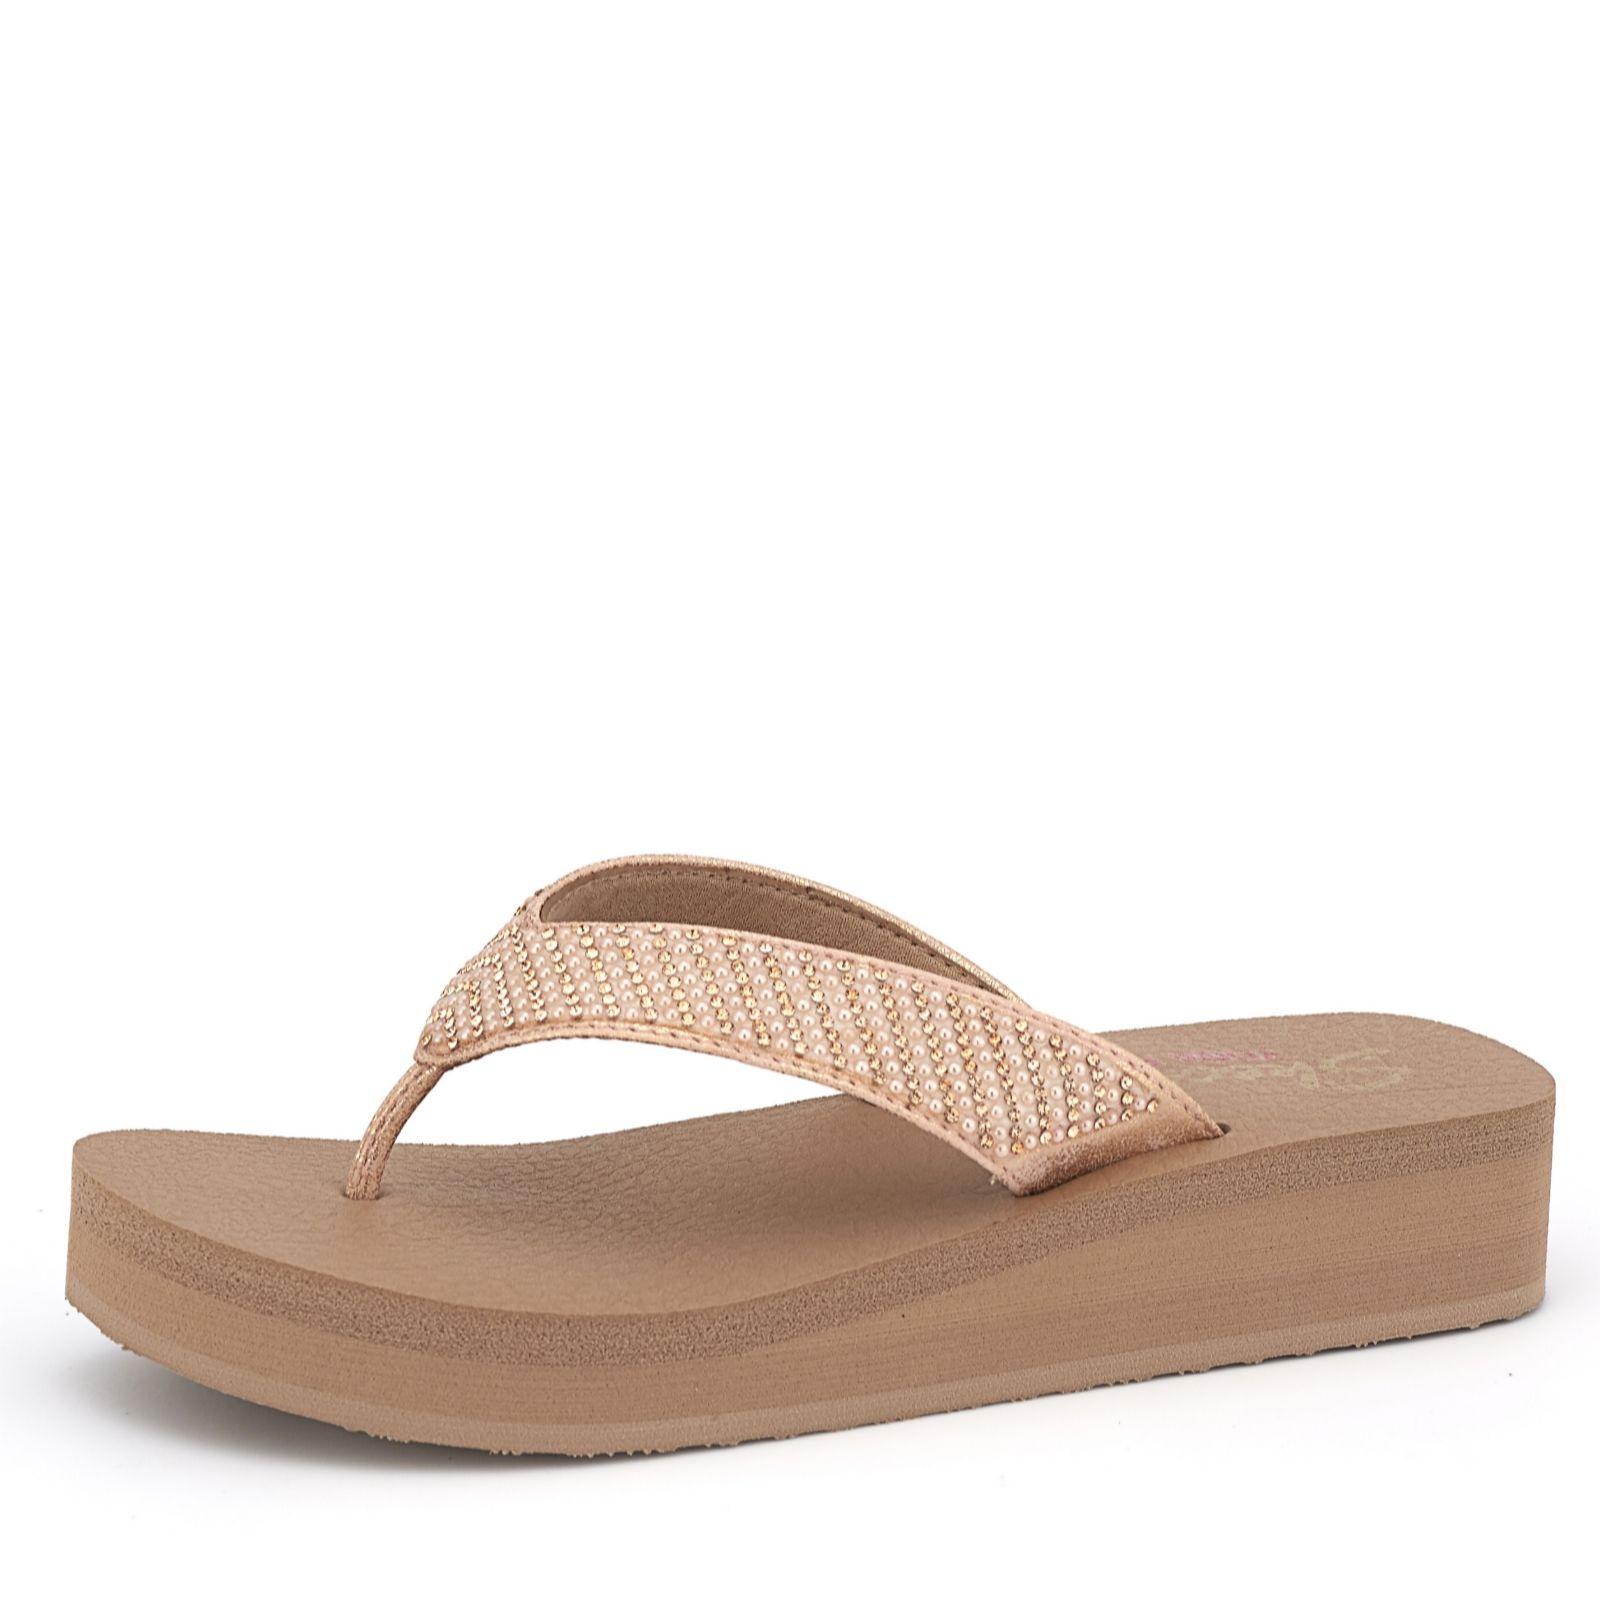 d57434d411caf Skechers Vinyasa Pearl   Rhinestone Toe Post Sandal with Yoga Foam - QVC UK